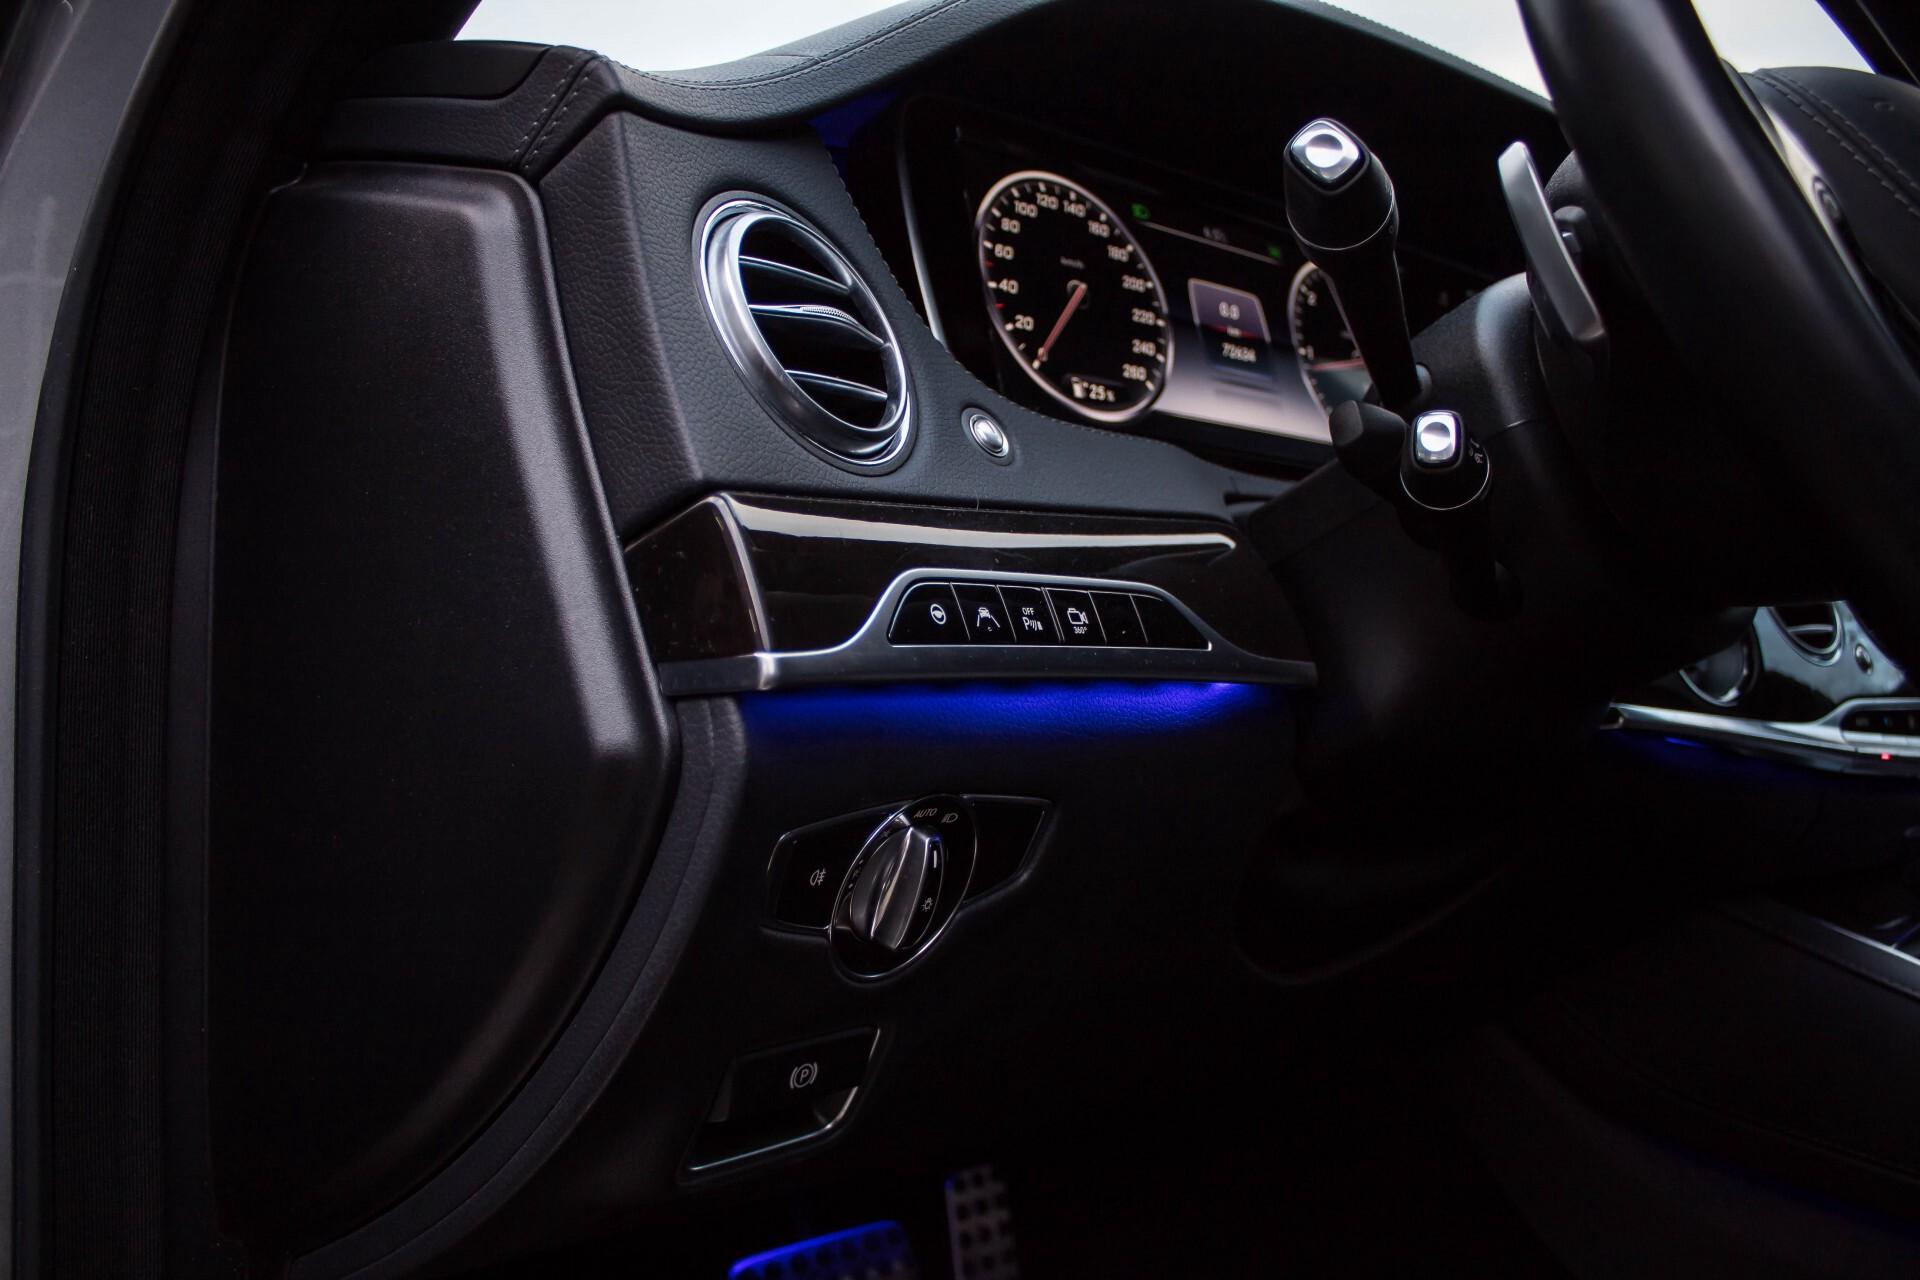 Mercedes-Benz S-Klasse 350 BlueTEC 63 AMG Panorama/Distronic/Keyless/Massage/Burmester Aut7 Foto 23